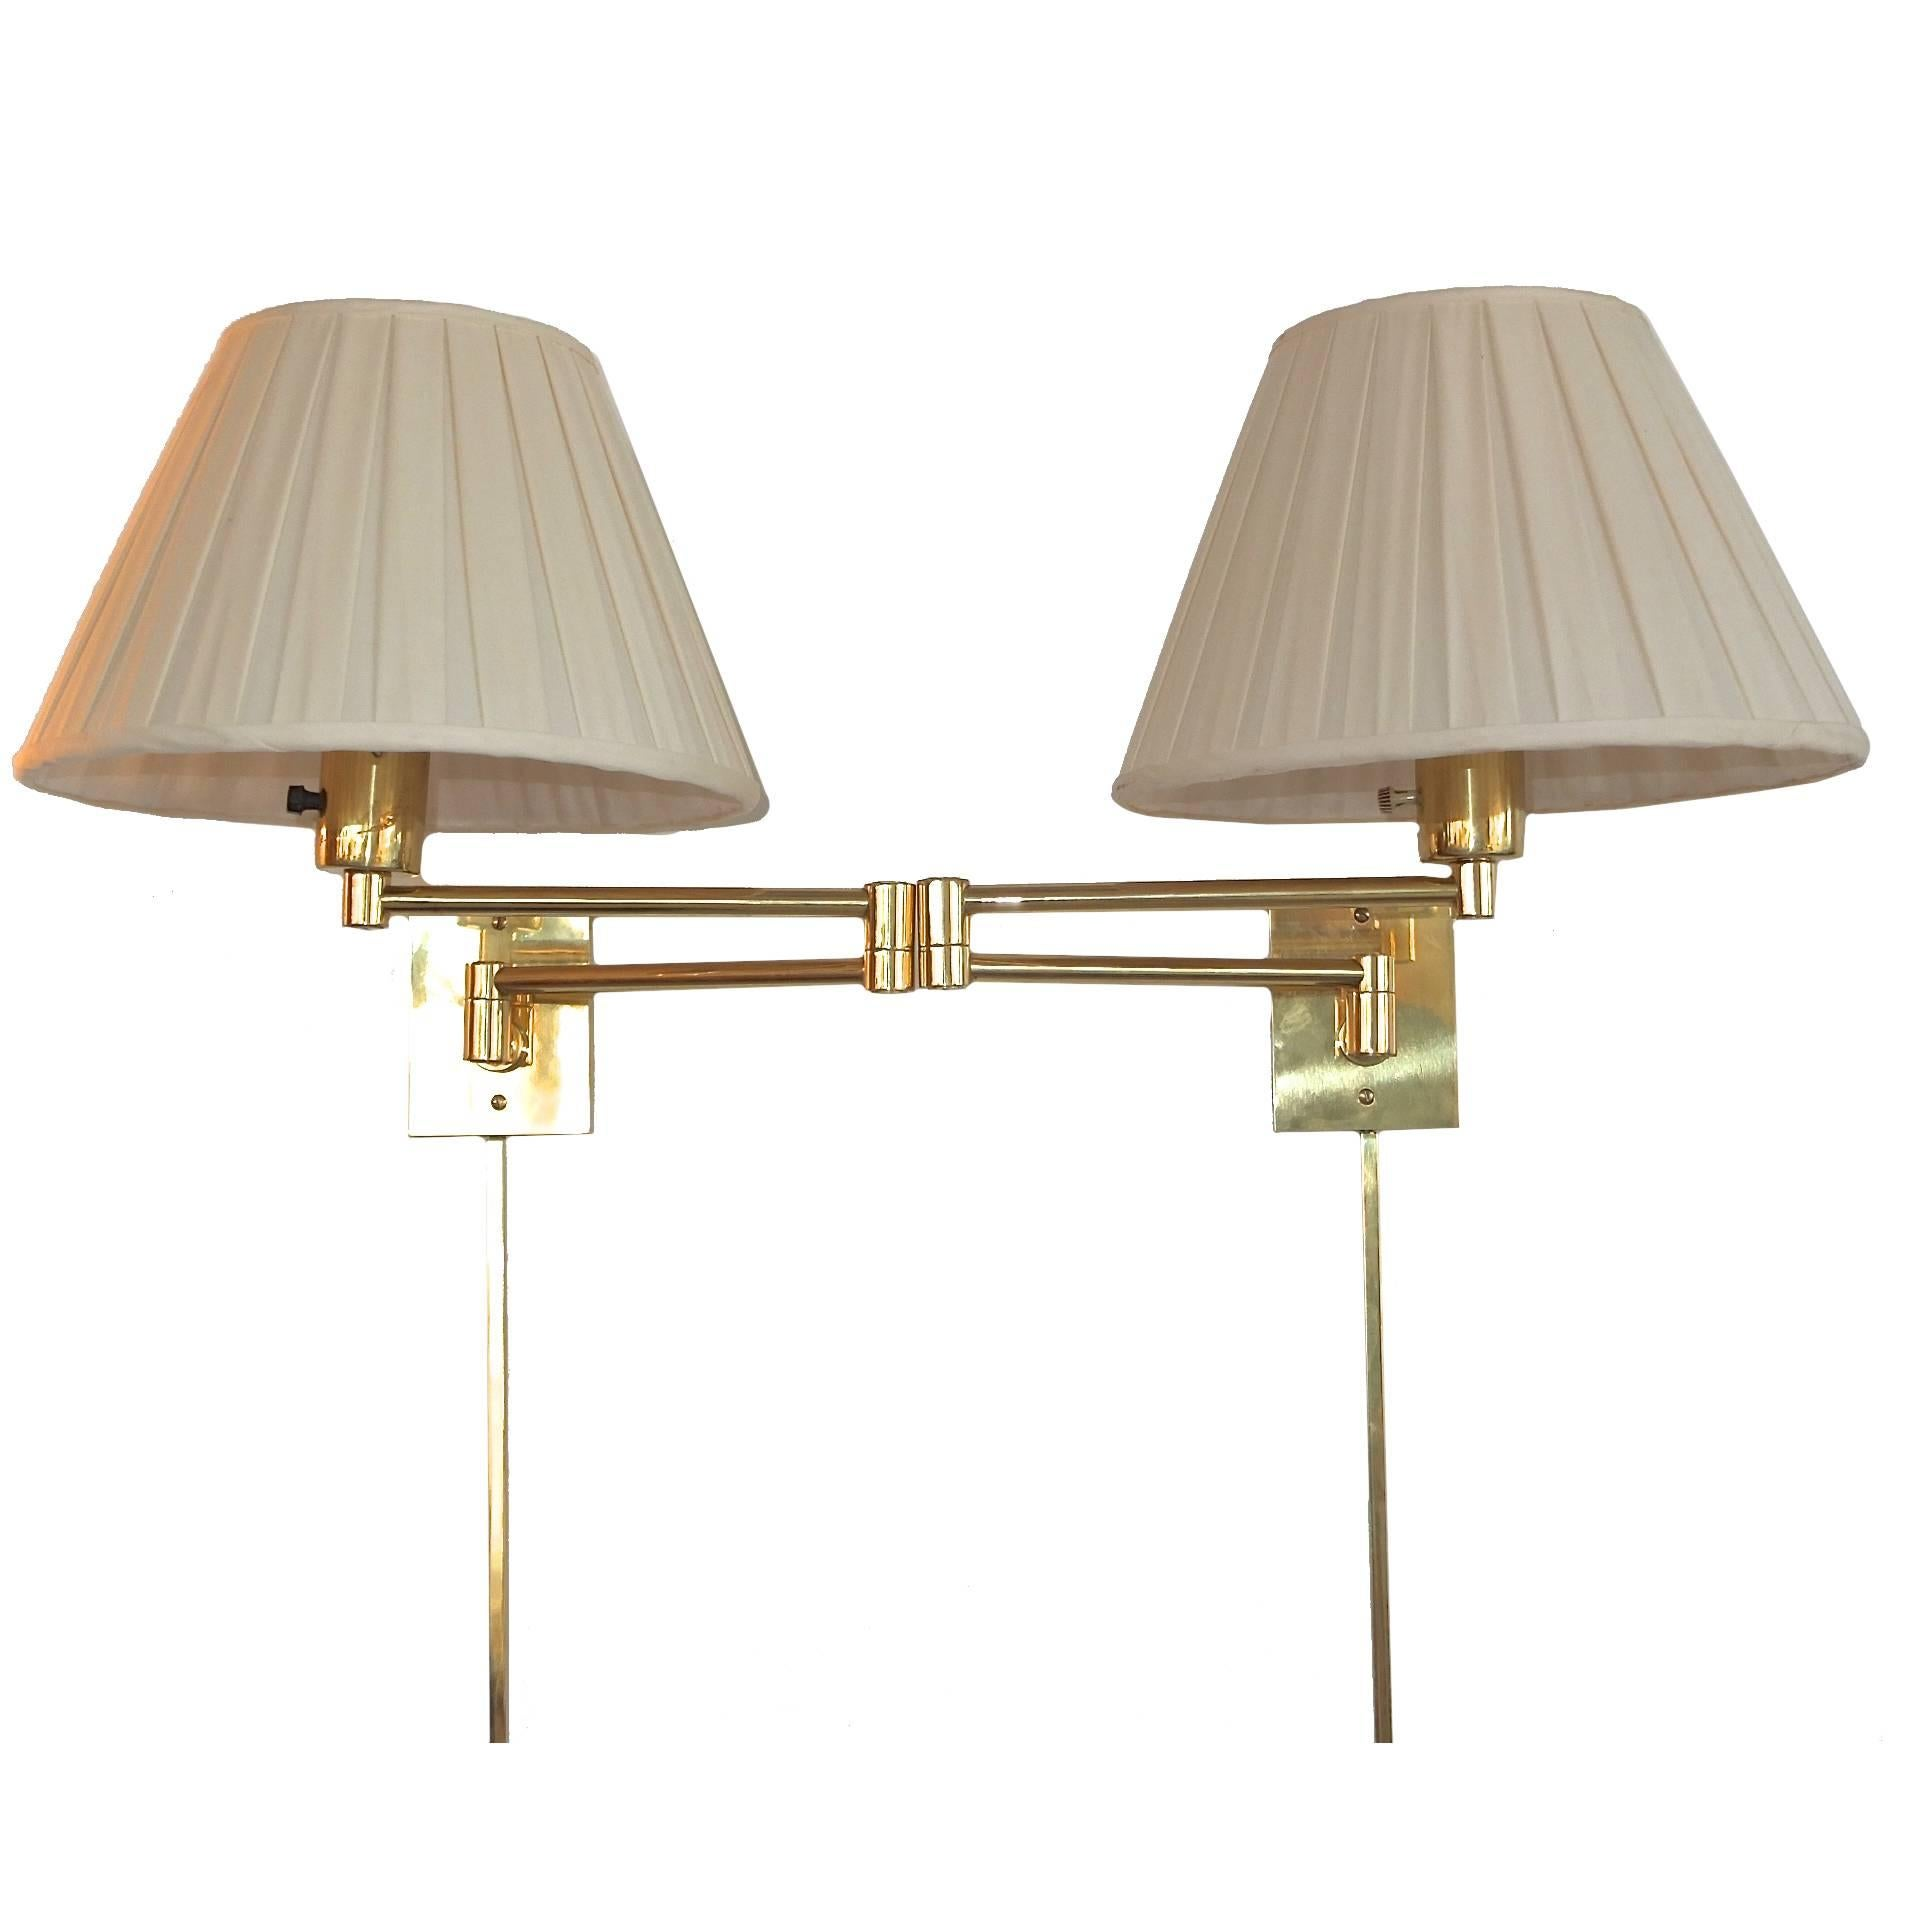 3 Pair of Georg W. Hansen Brass 1706 Double Swing Arm Wall Lamps